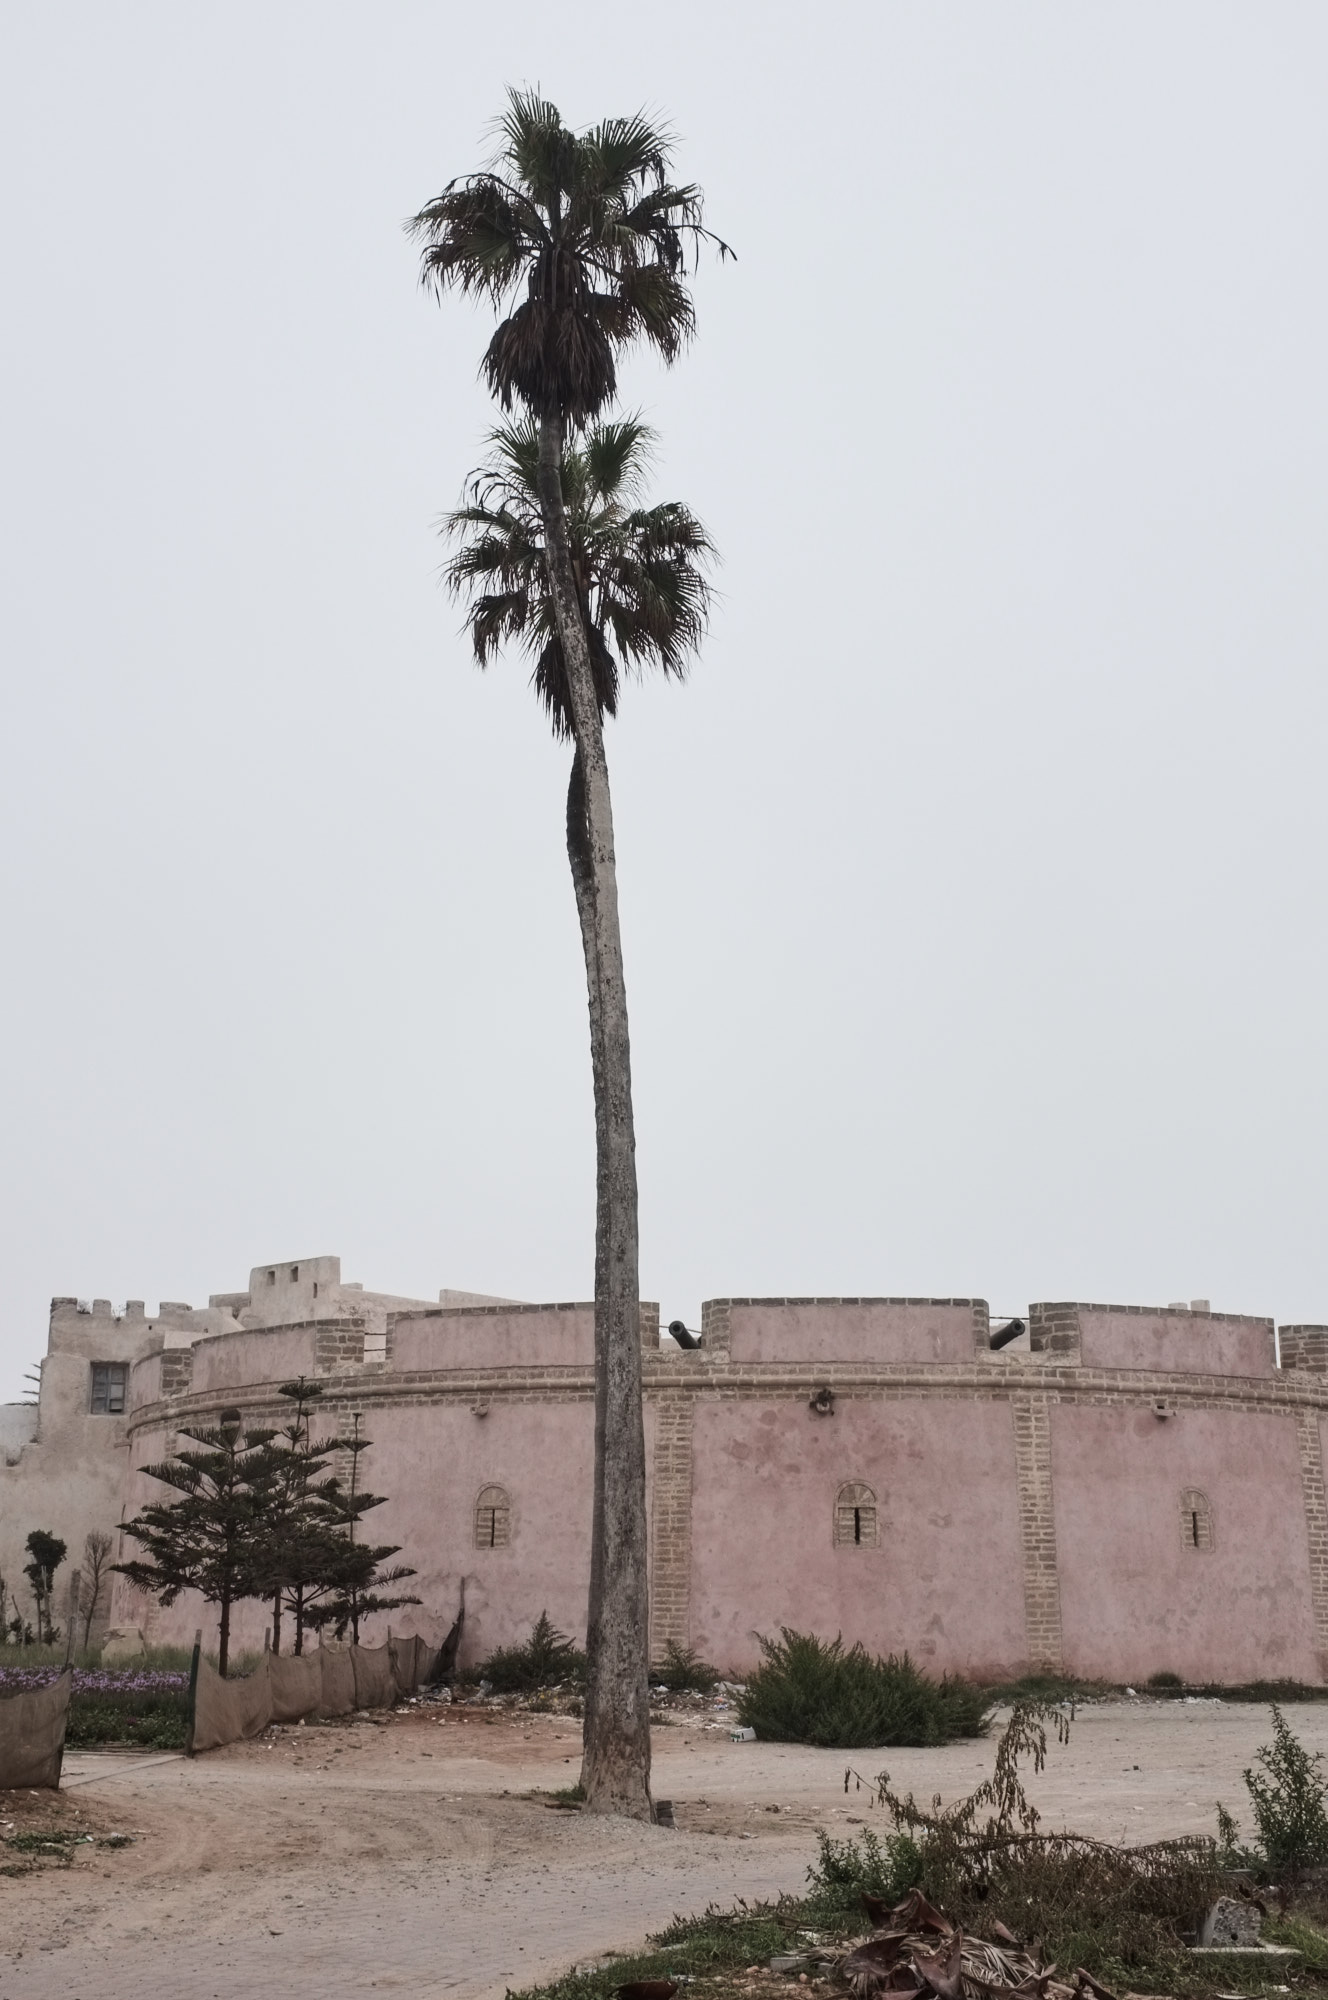 SMCLEOD_Morocco_2016_09_46